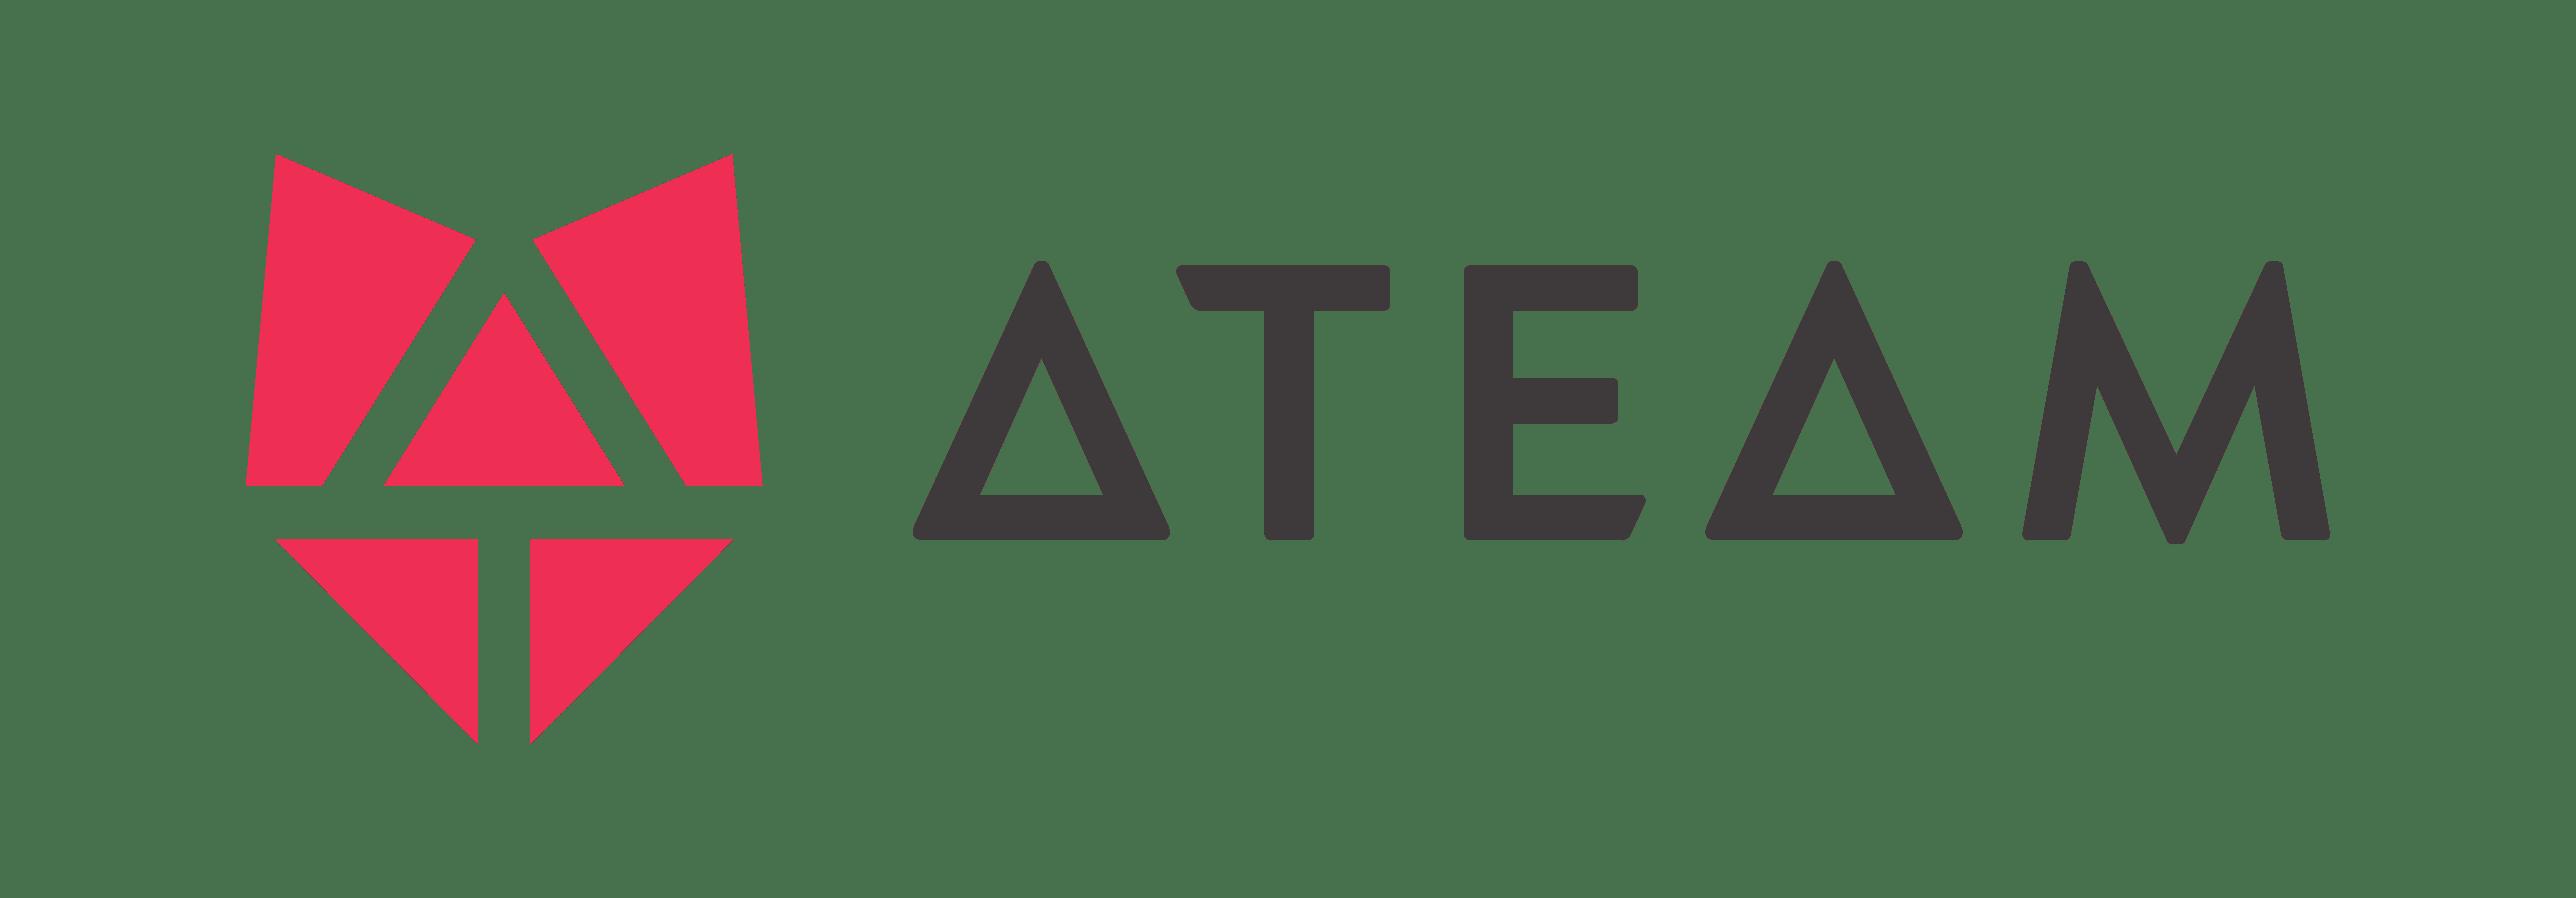 Ateam Logo